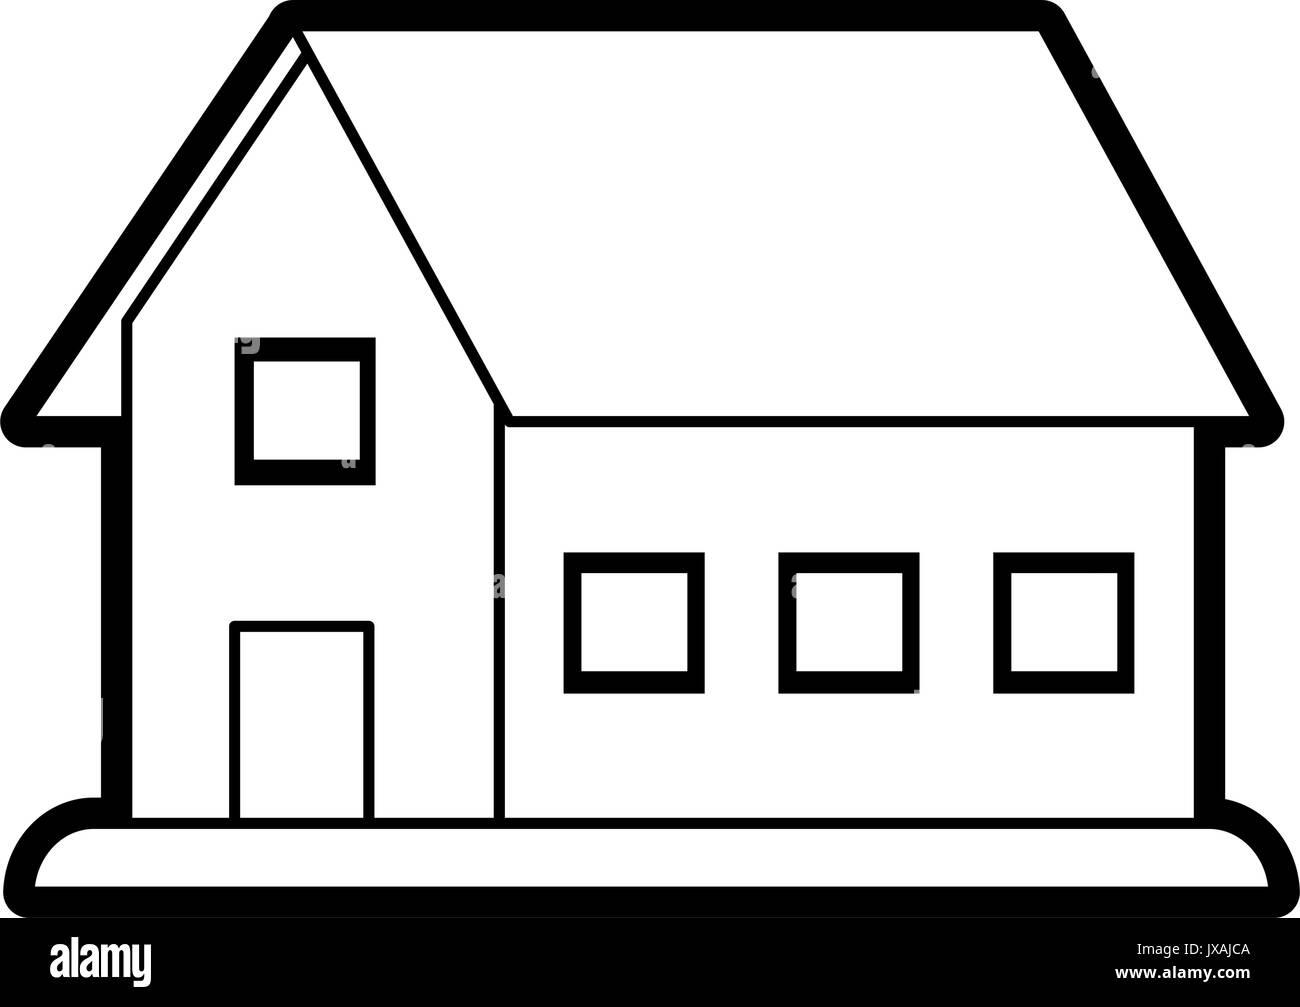 Climbing Roof Stock Illustrations – 224 Climbing Roof Stock Illustrations,  Vectors & Clipart - Dreamstime